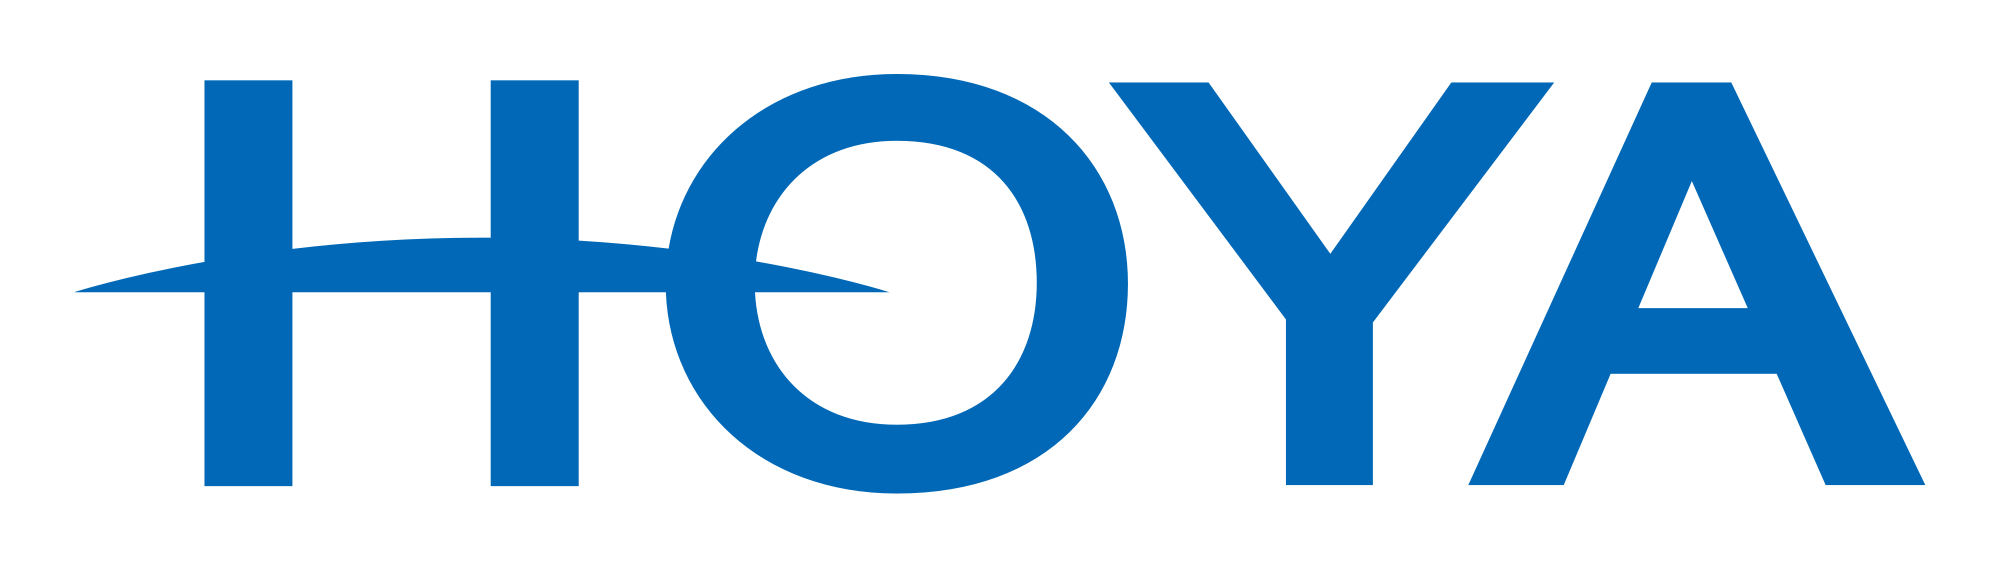 2000px-Hoya_Logo.png